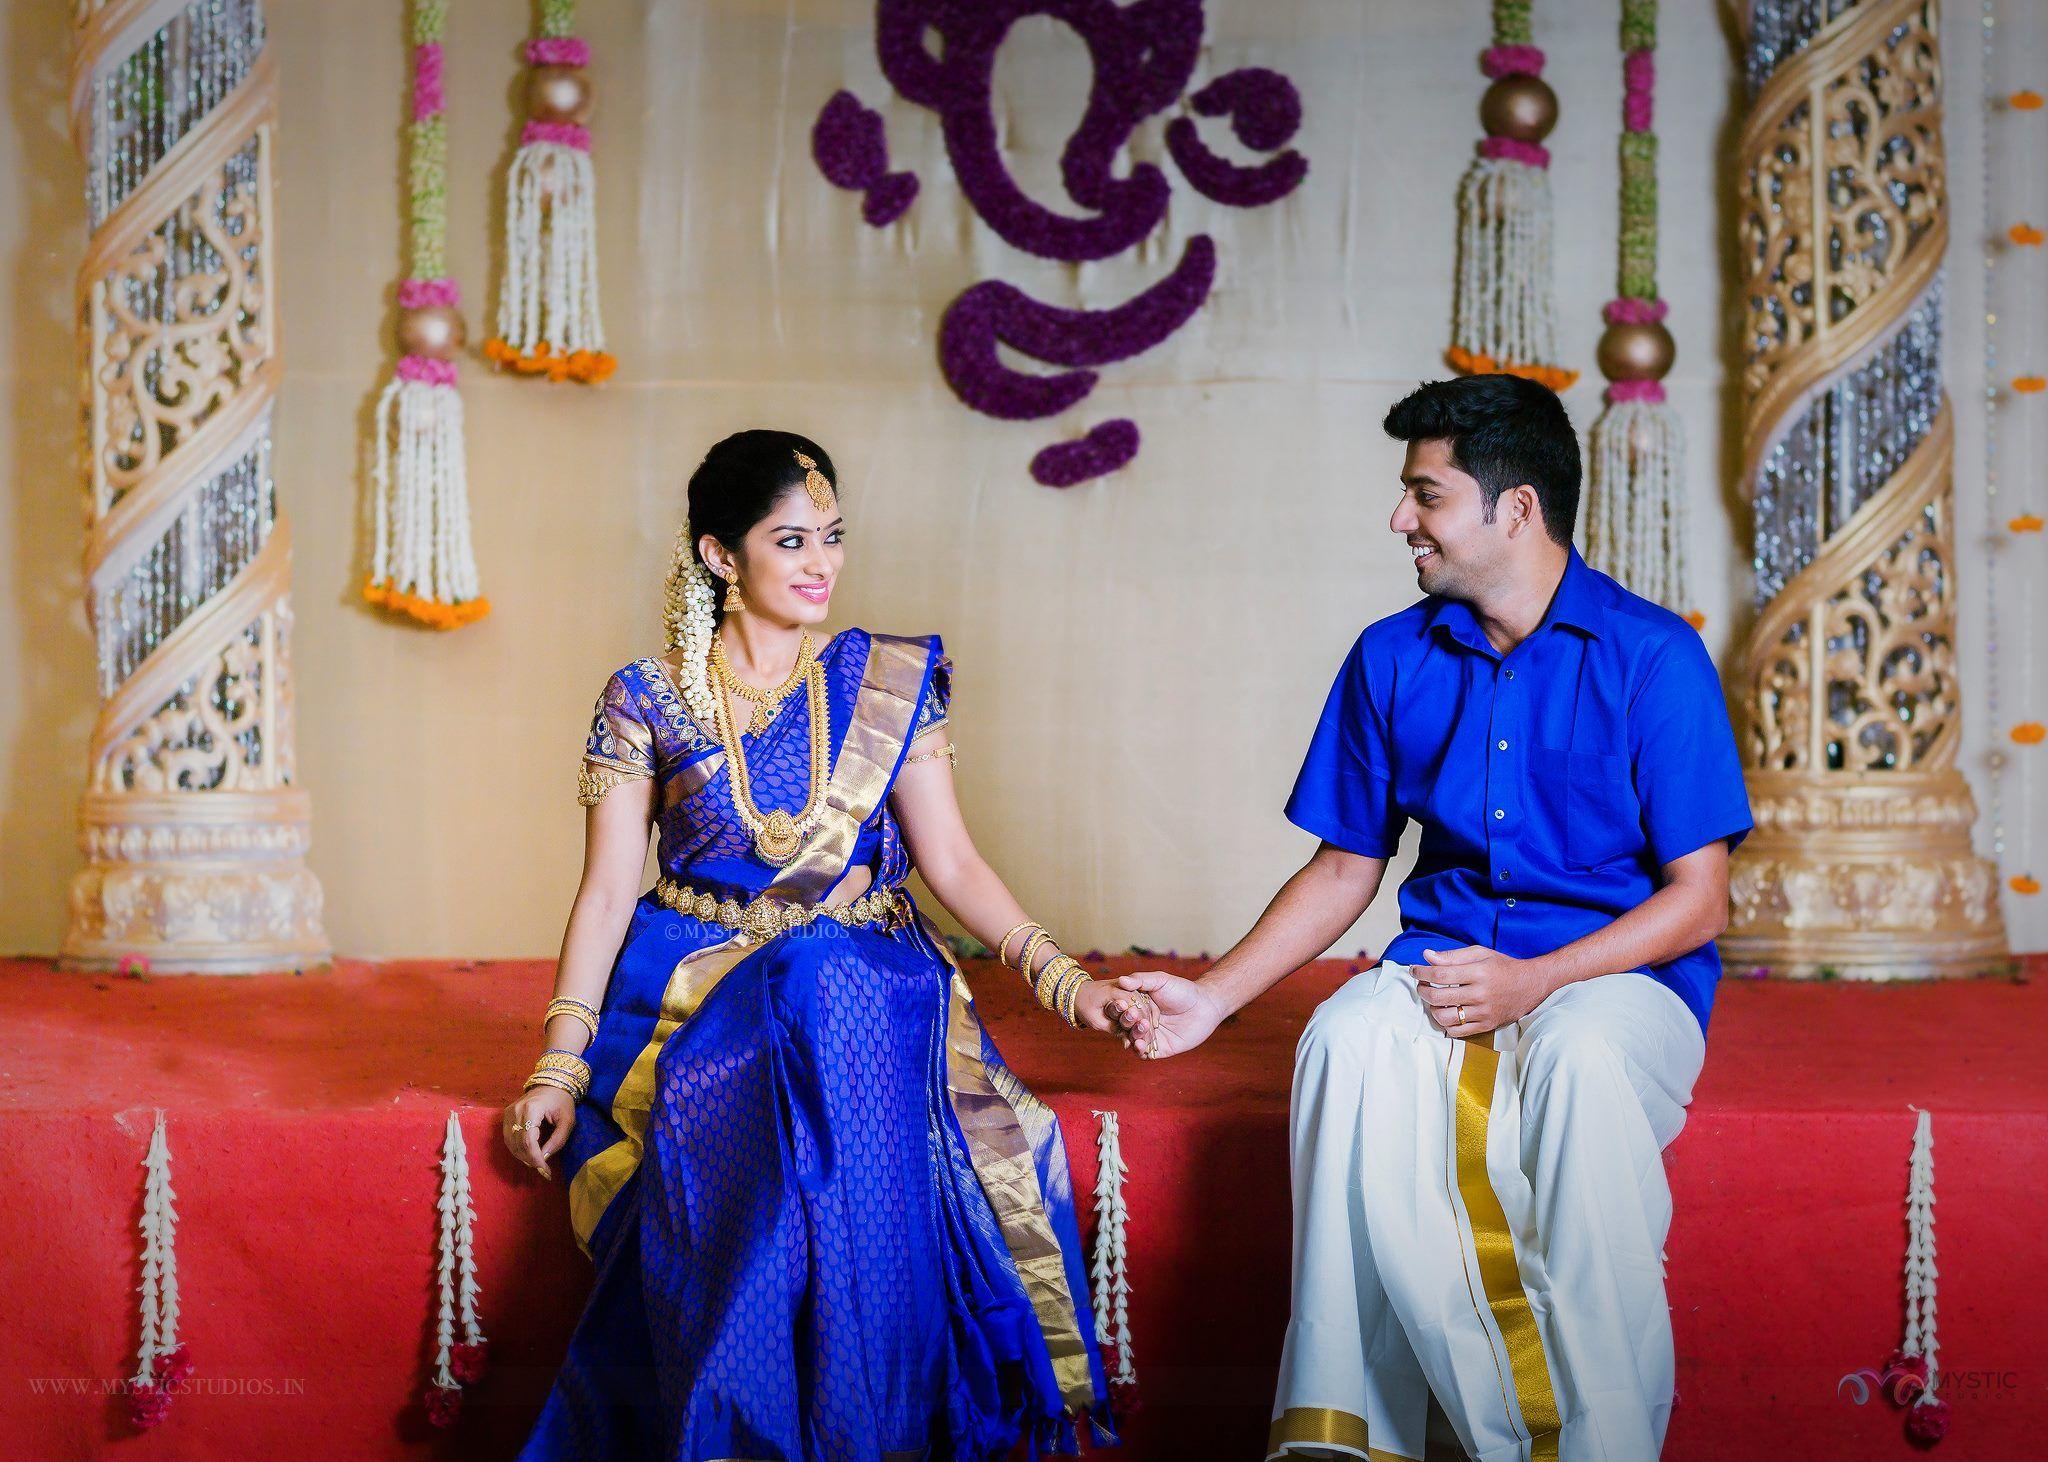 Exclusive Pics of Sun Music VJ Diya Menon's Engagement